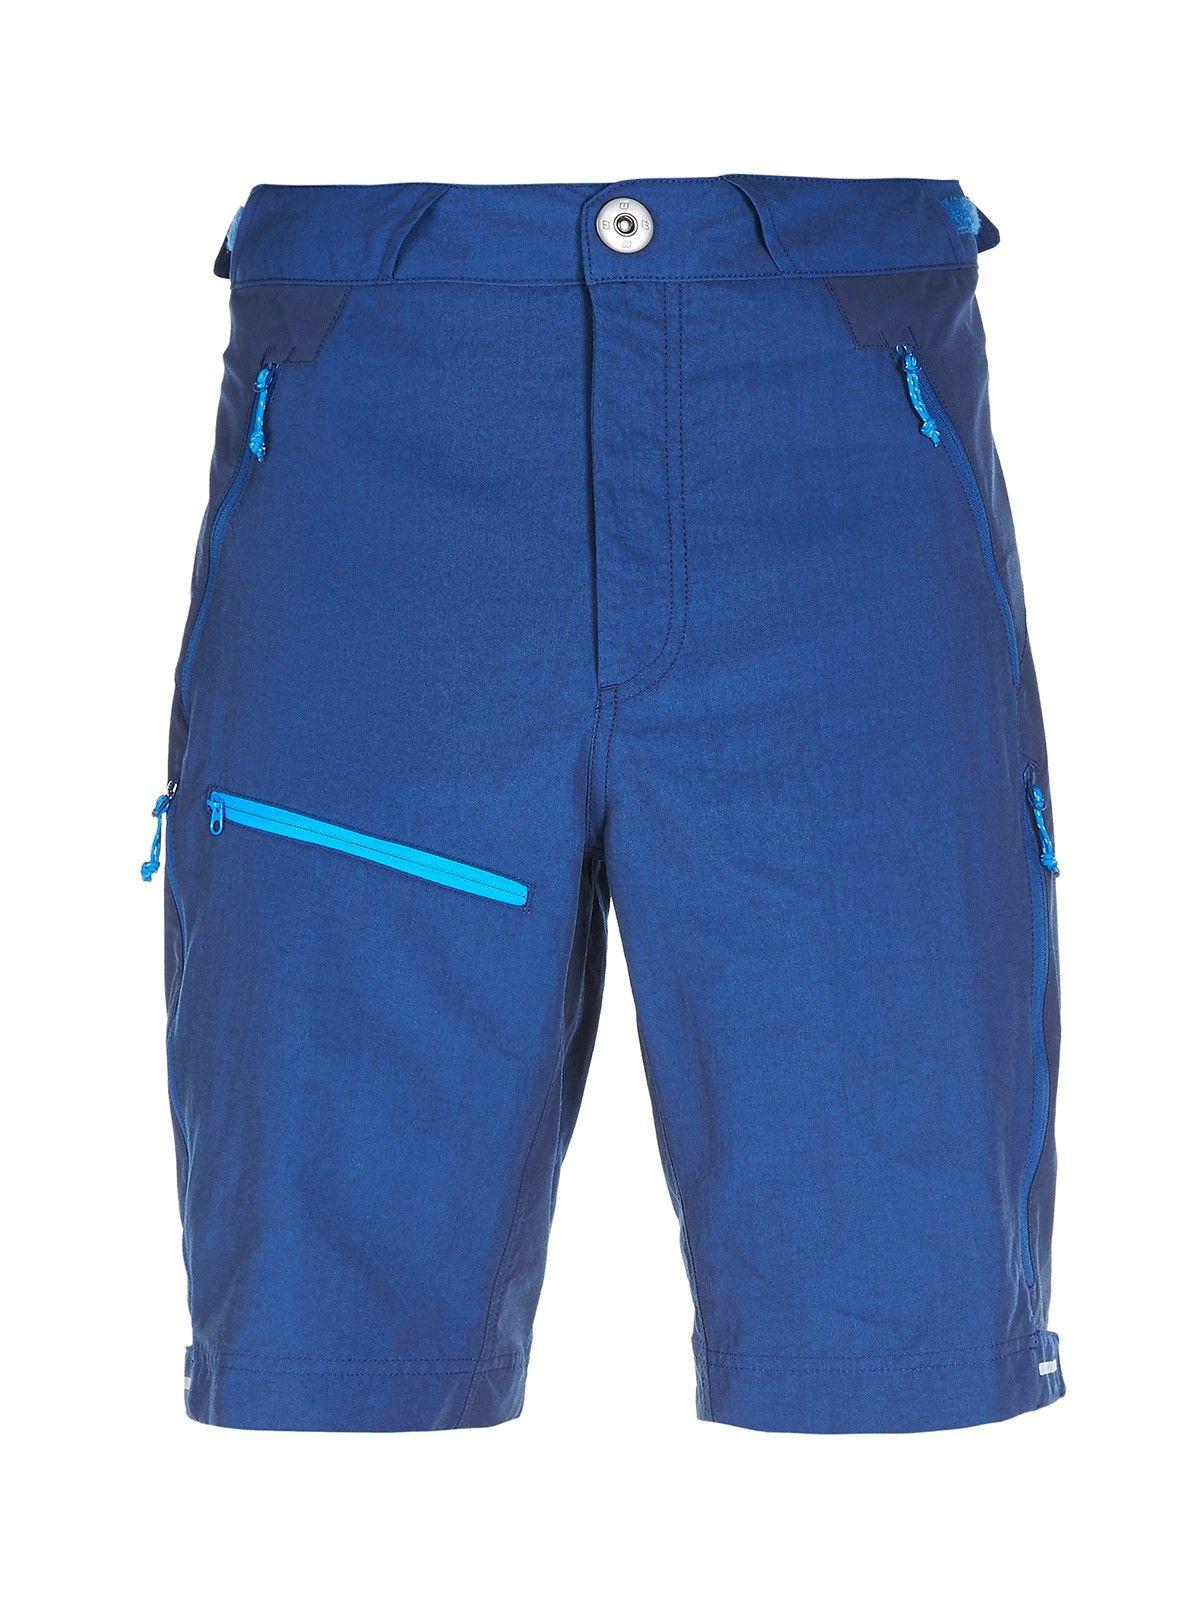 Berghaus Baggy Shorts Blau, Male Shorts, 40